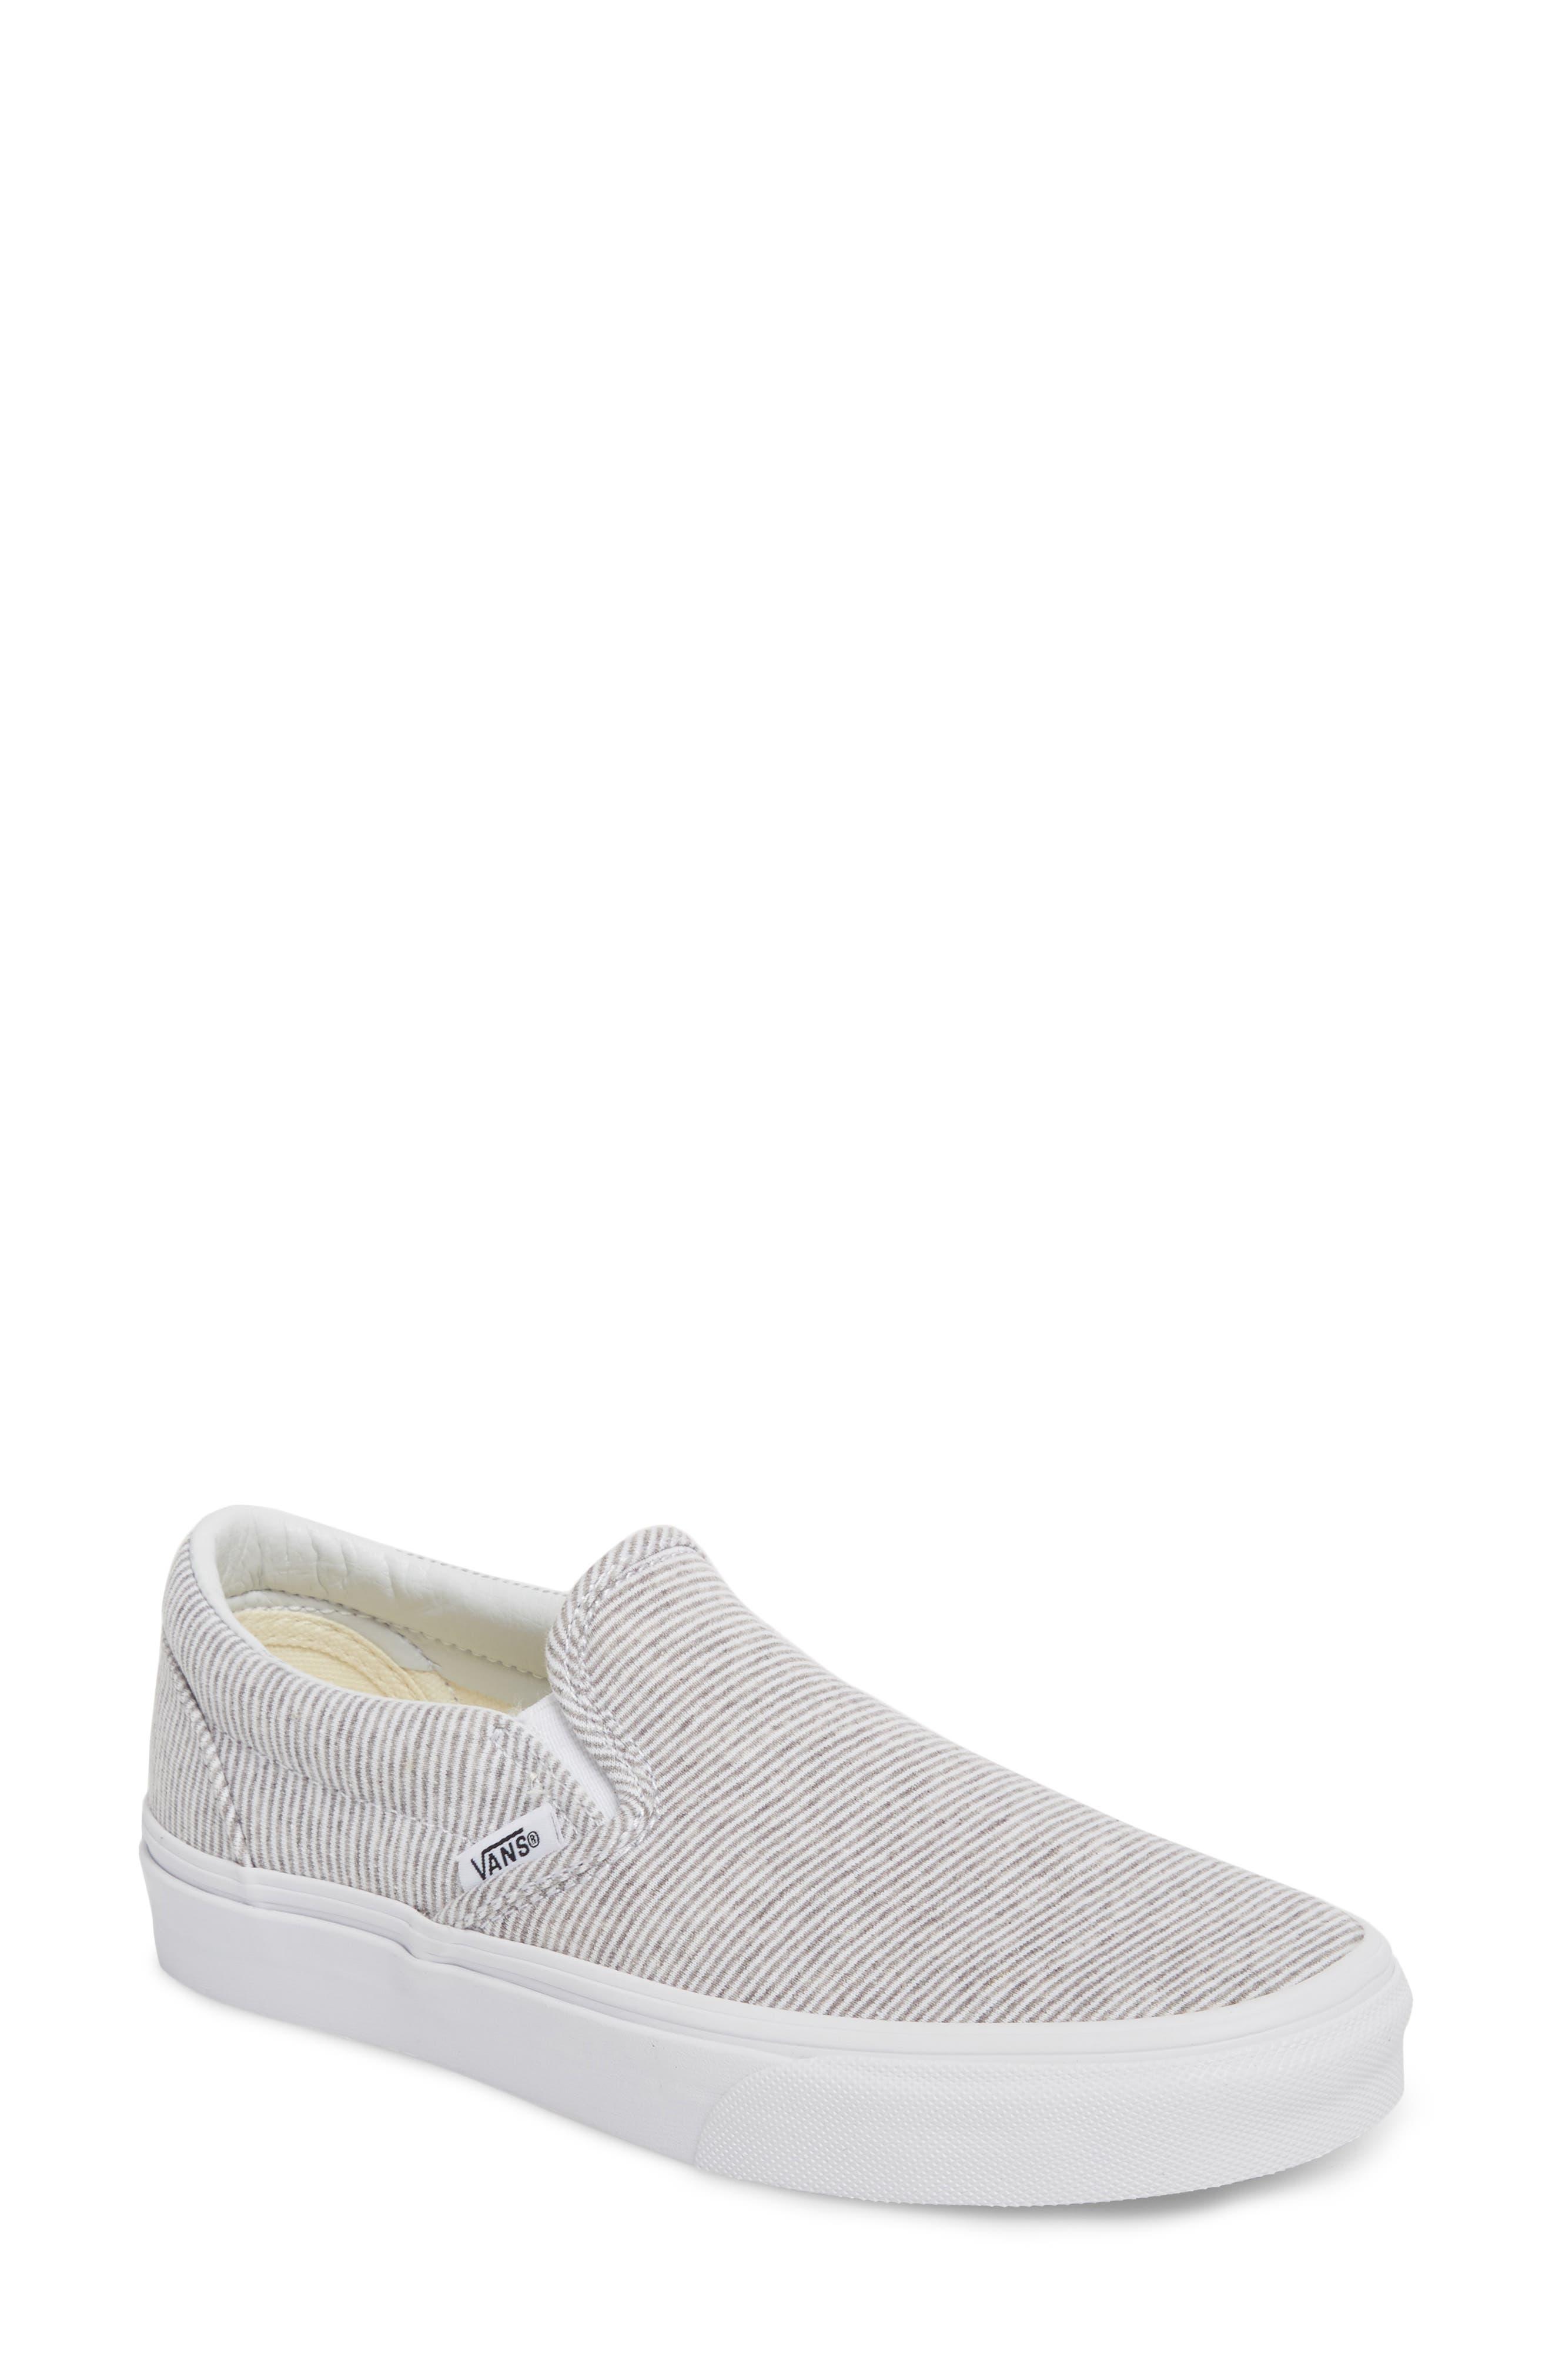 ,                             Classic Slip-On Sneaker,                             Main thumbnail 93, color,                             031